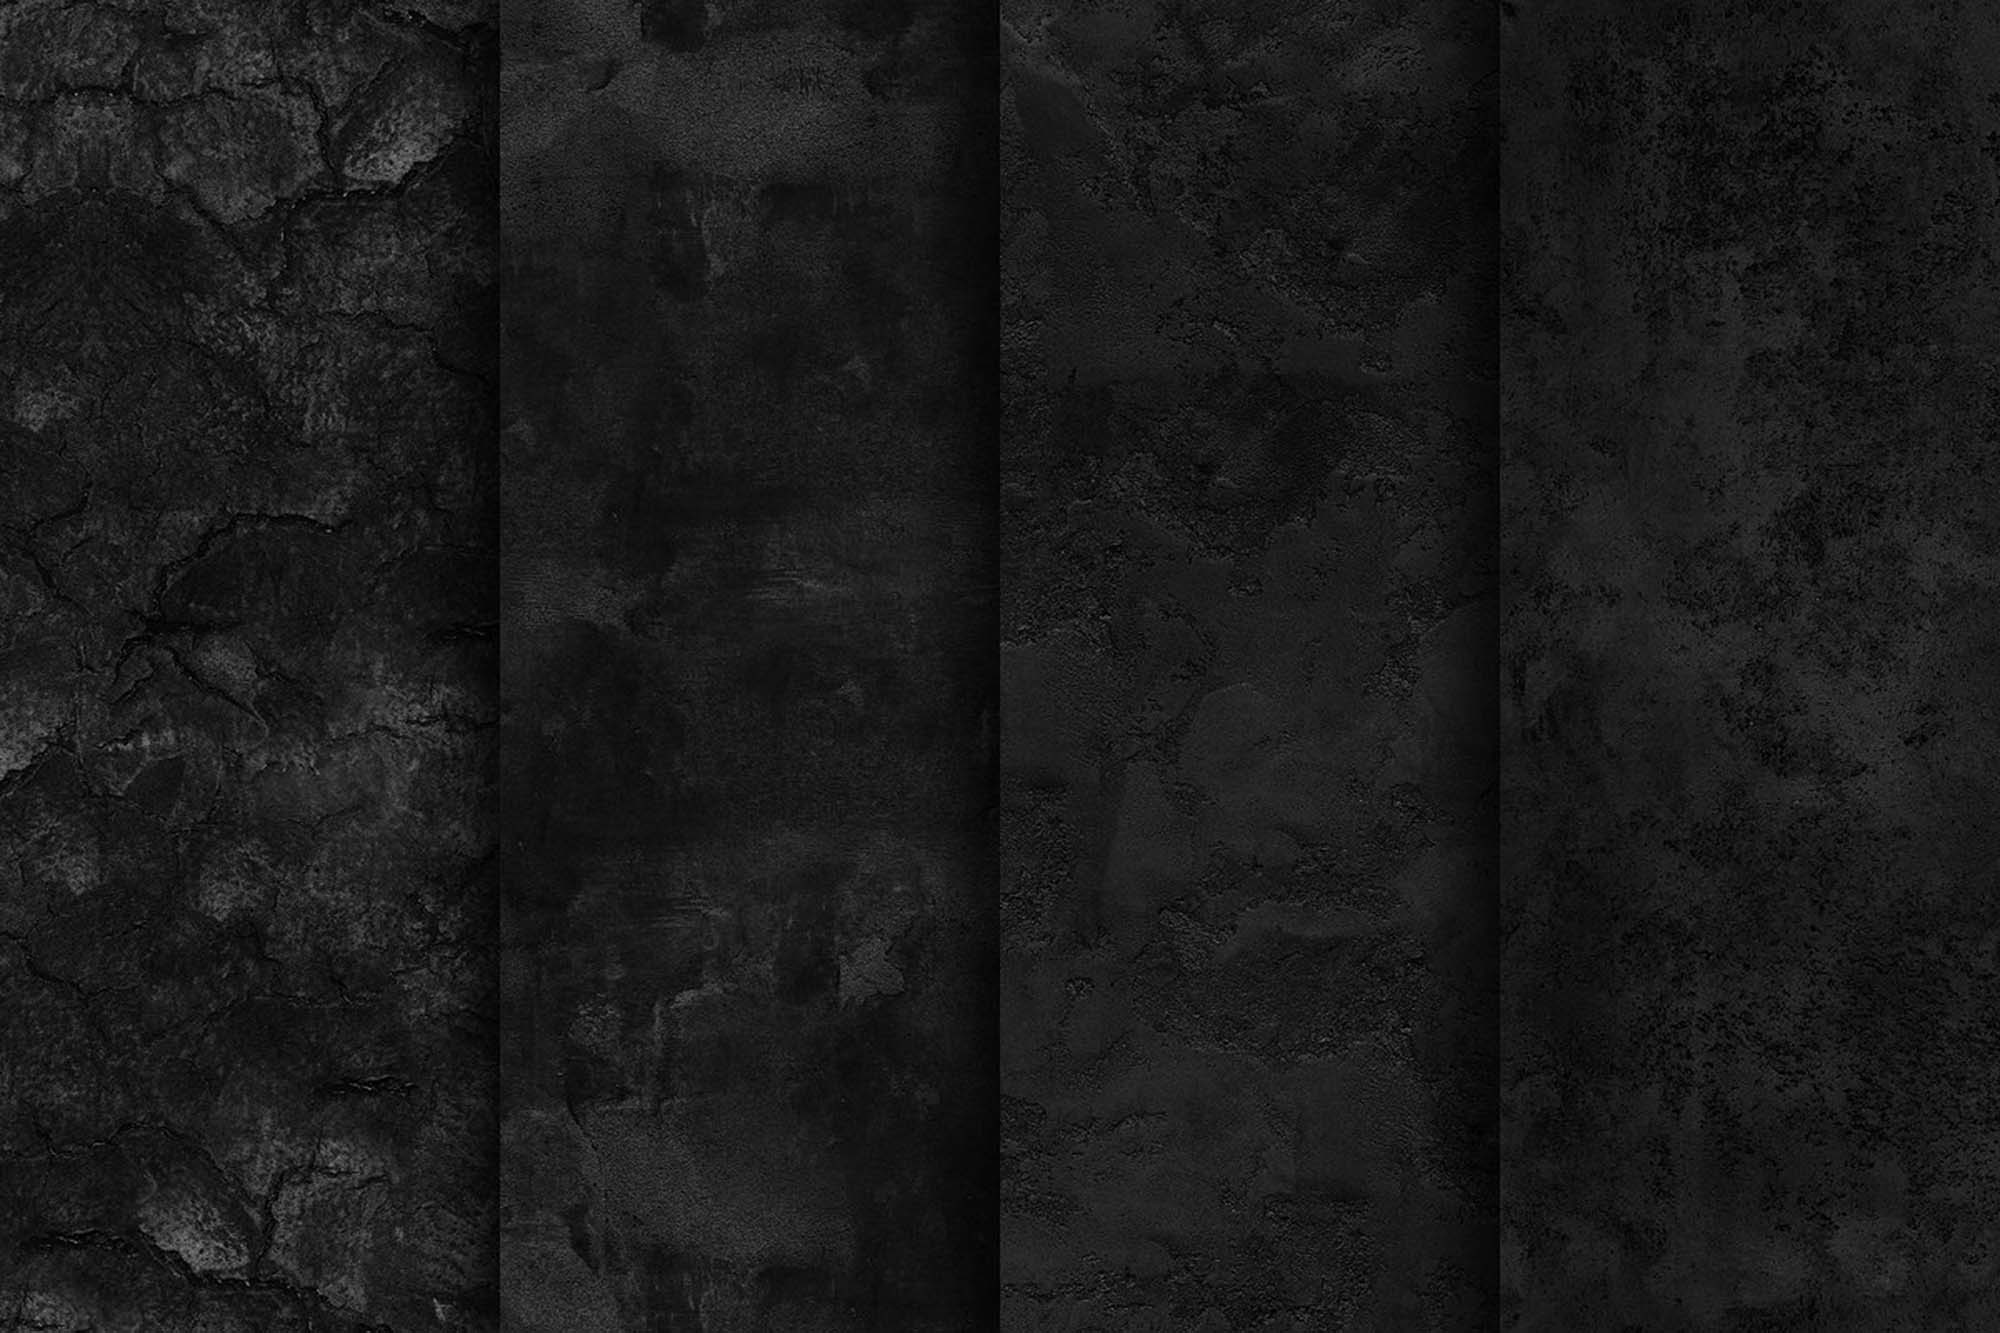 Seamless Black Textures